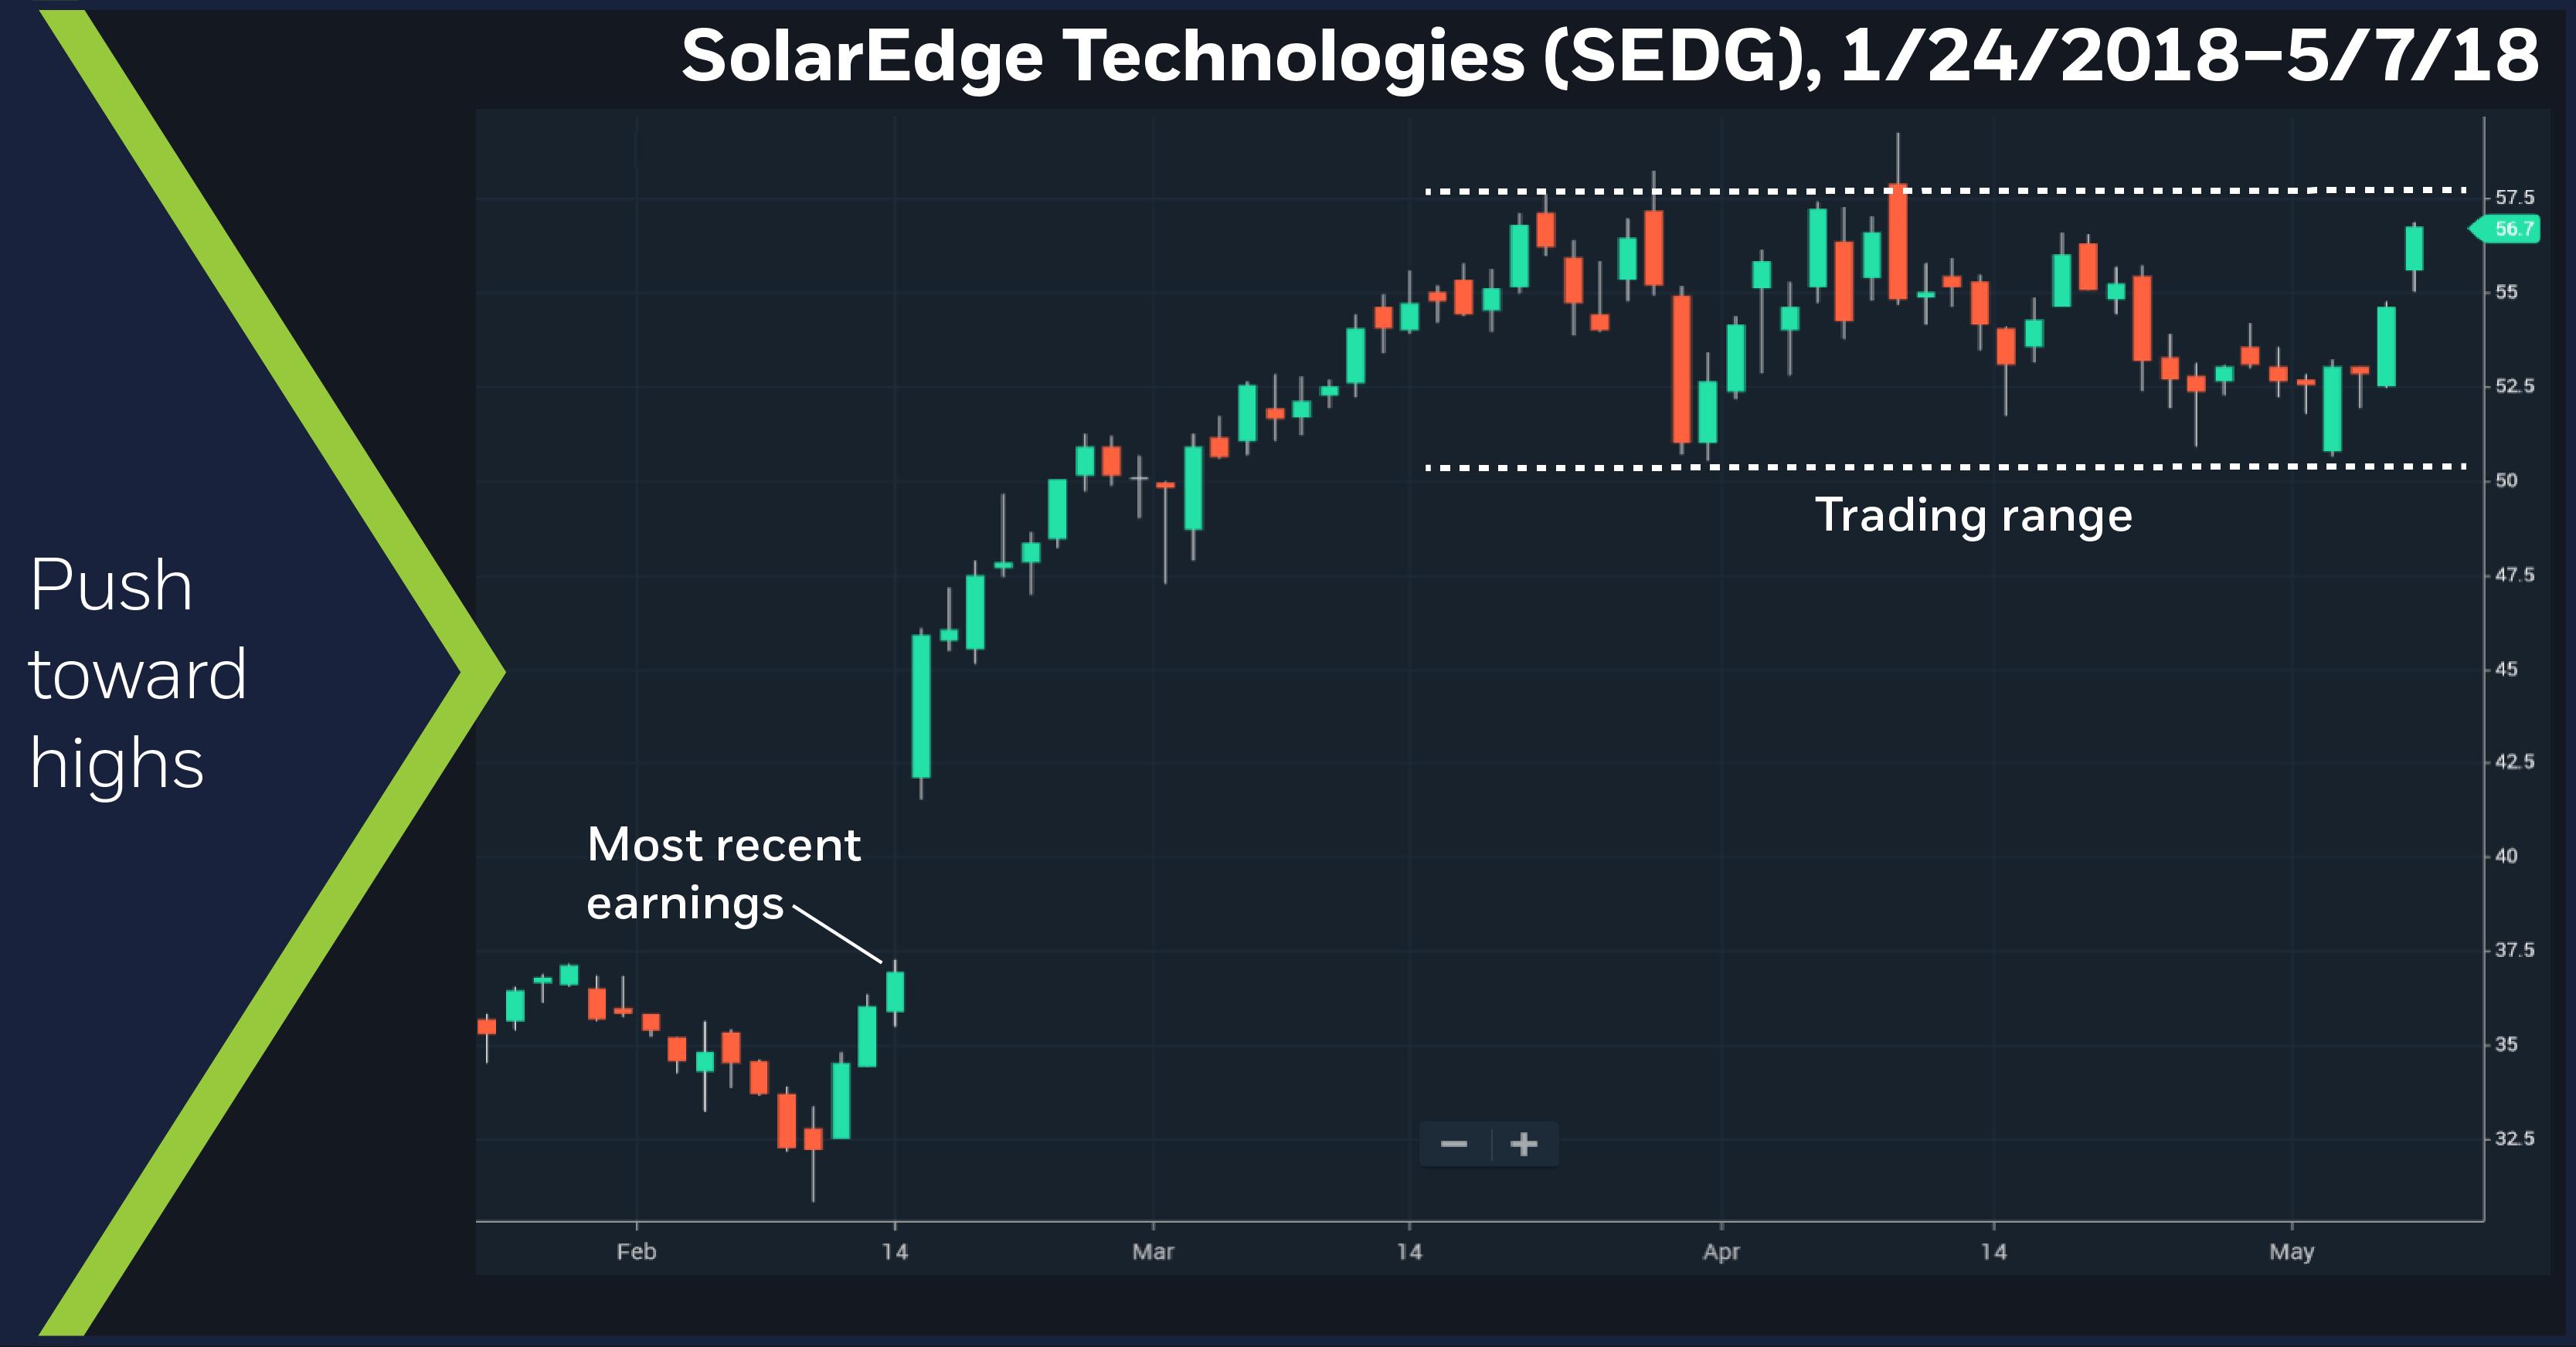 SolarEdge Technologies (SEDG), 1/24/2018 – 5/7/18